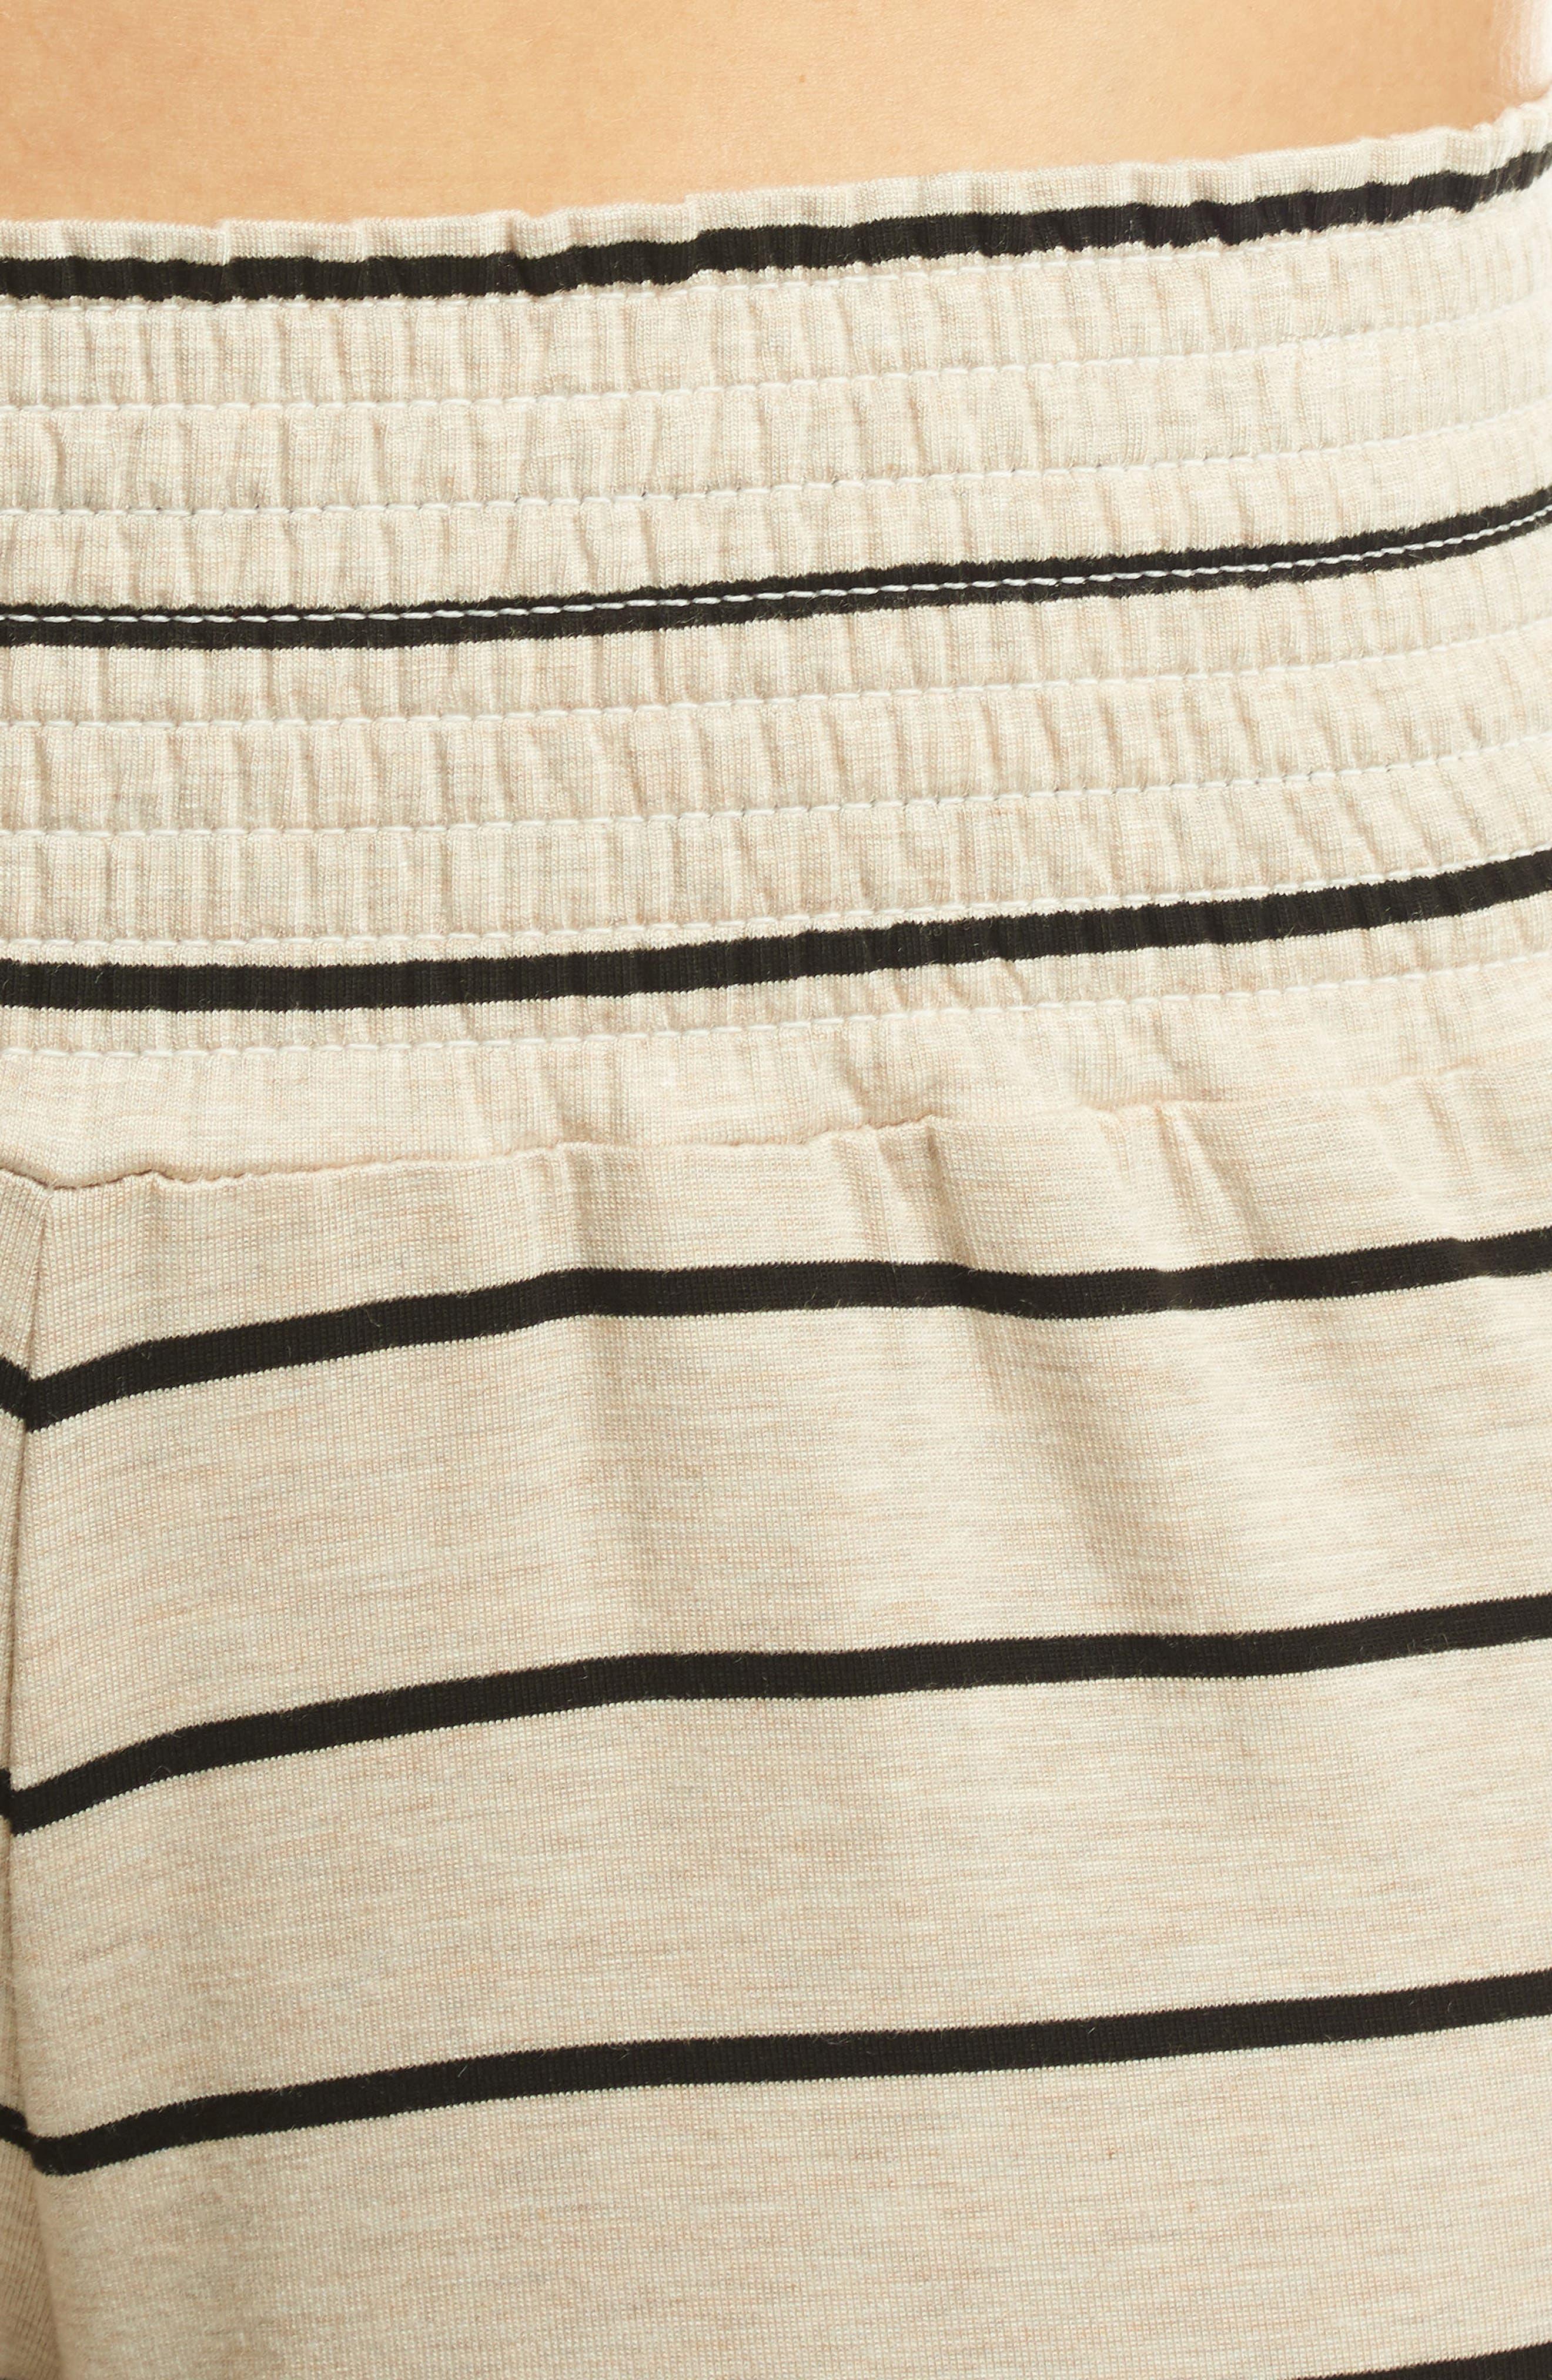 Roxanne - During & After 5-Piece Maternity Sleepwear Set,                             Alternate thumbnail 4, color,                             SAND STRIPE